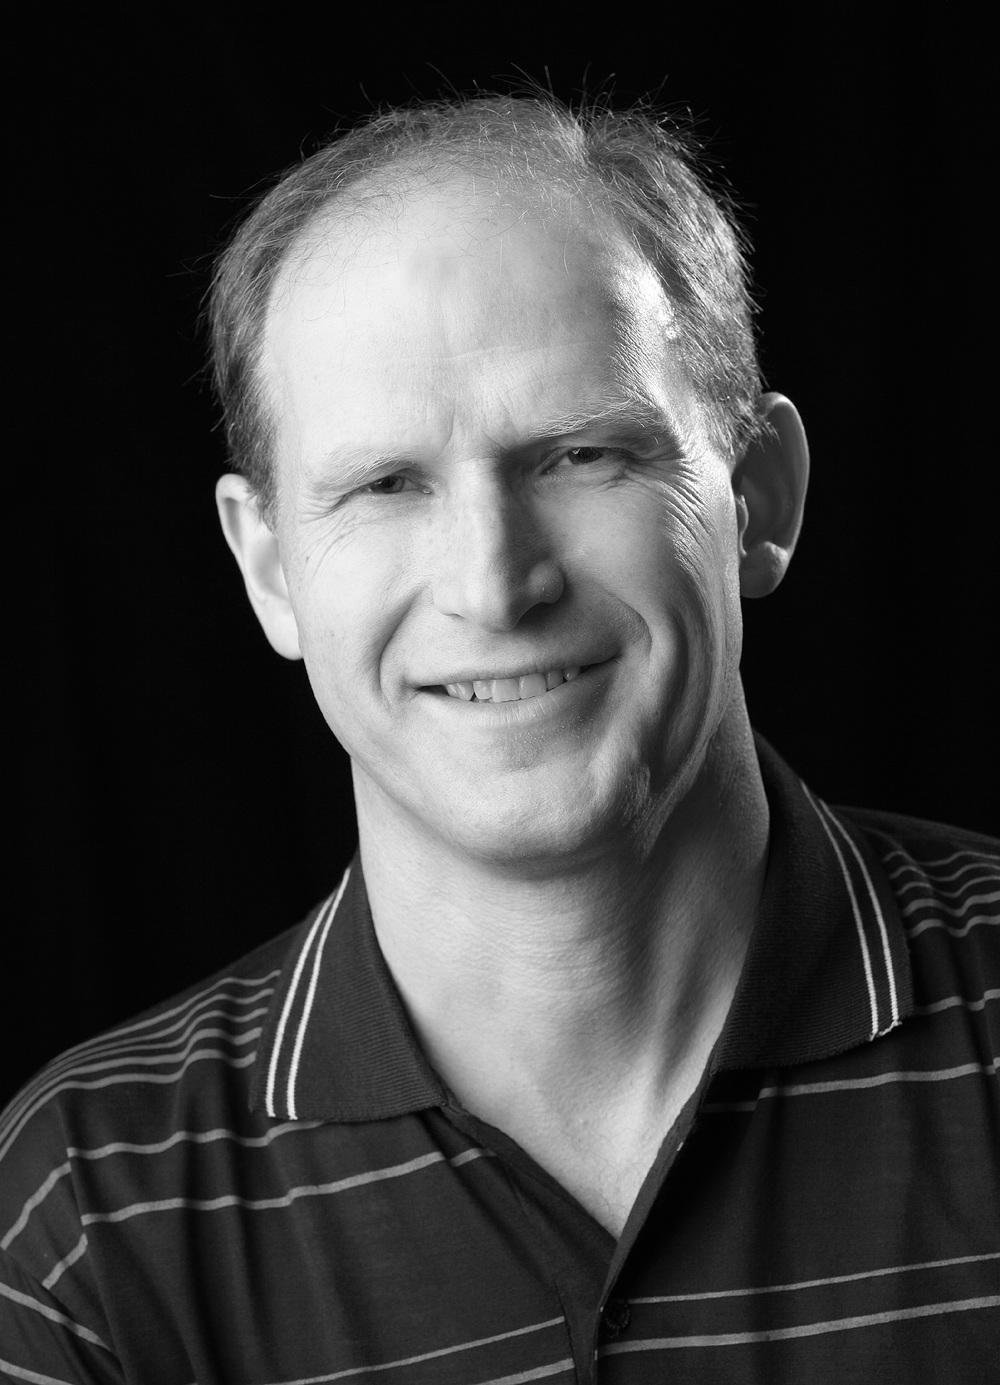 Gebhard Ettwein, Möbel- + Massivholzspezialist